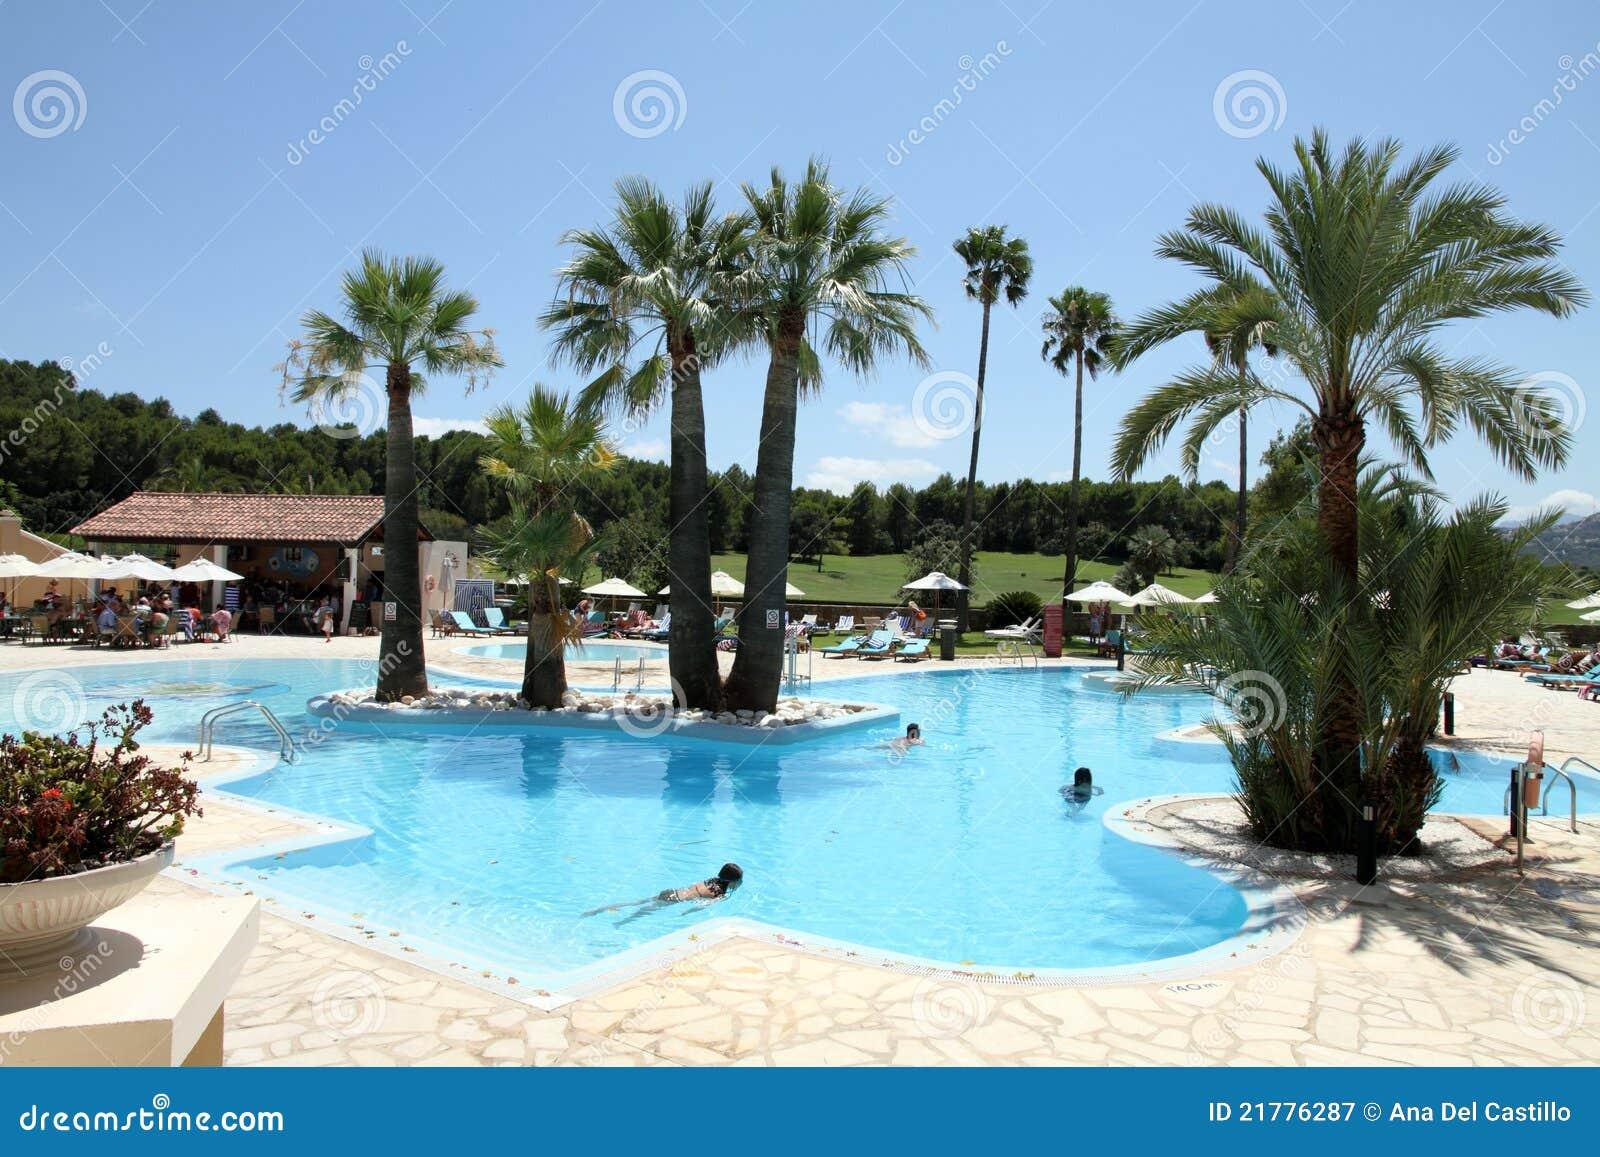 swimming pool resort denia alicante spain royalty free stock photography image 21776287